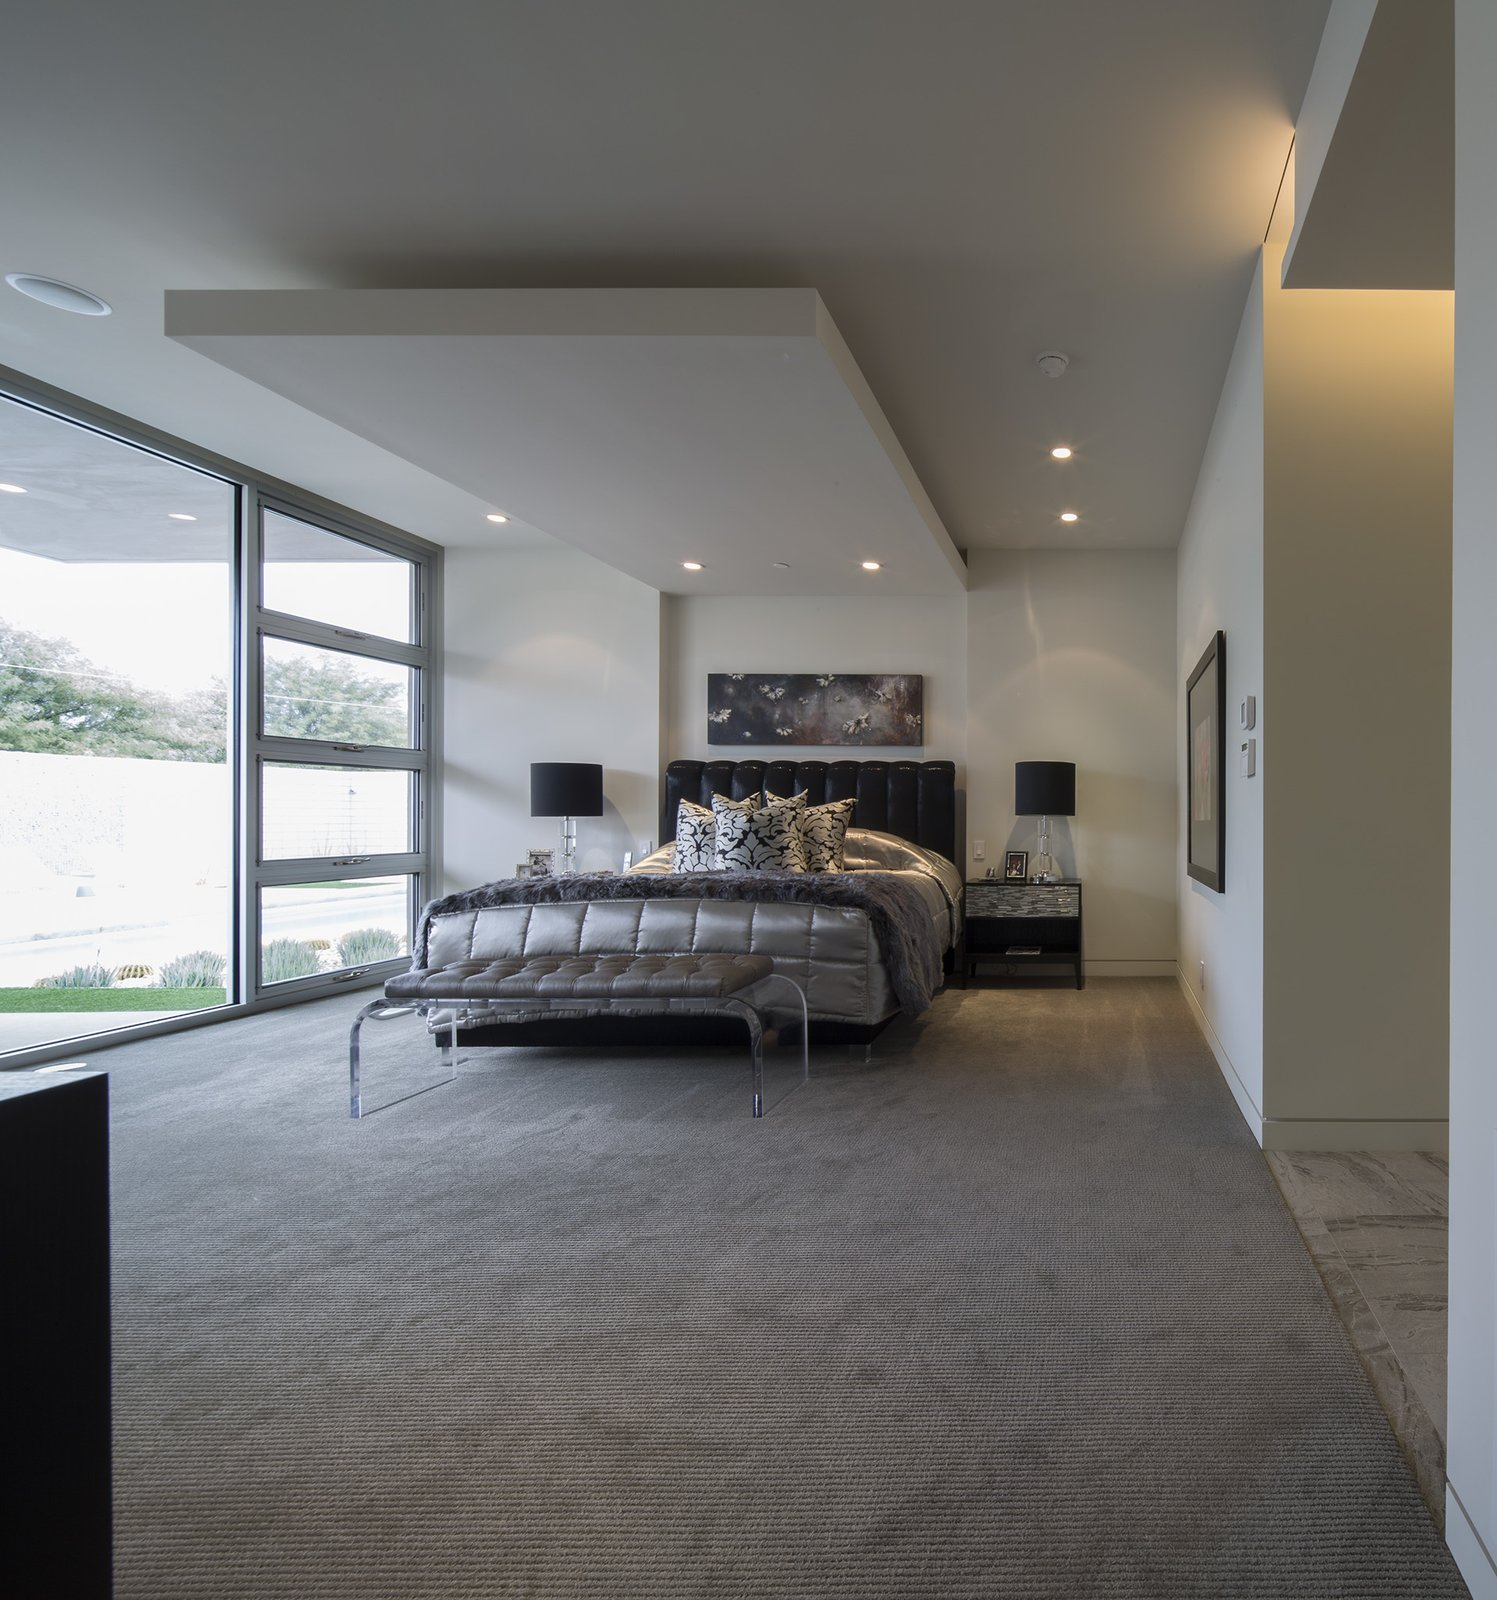 Bedroom, Night Stands, Bed, Dresser, Bench, Table Lighting, Recessed Lighting, Porcelain Tile Floor, and Carpet Floor  Birds Nest